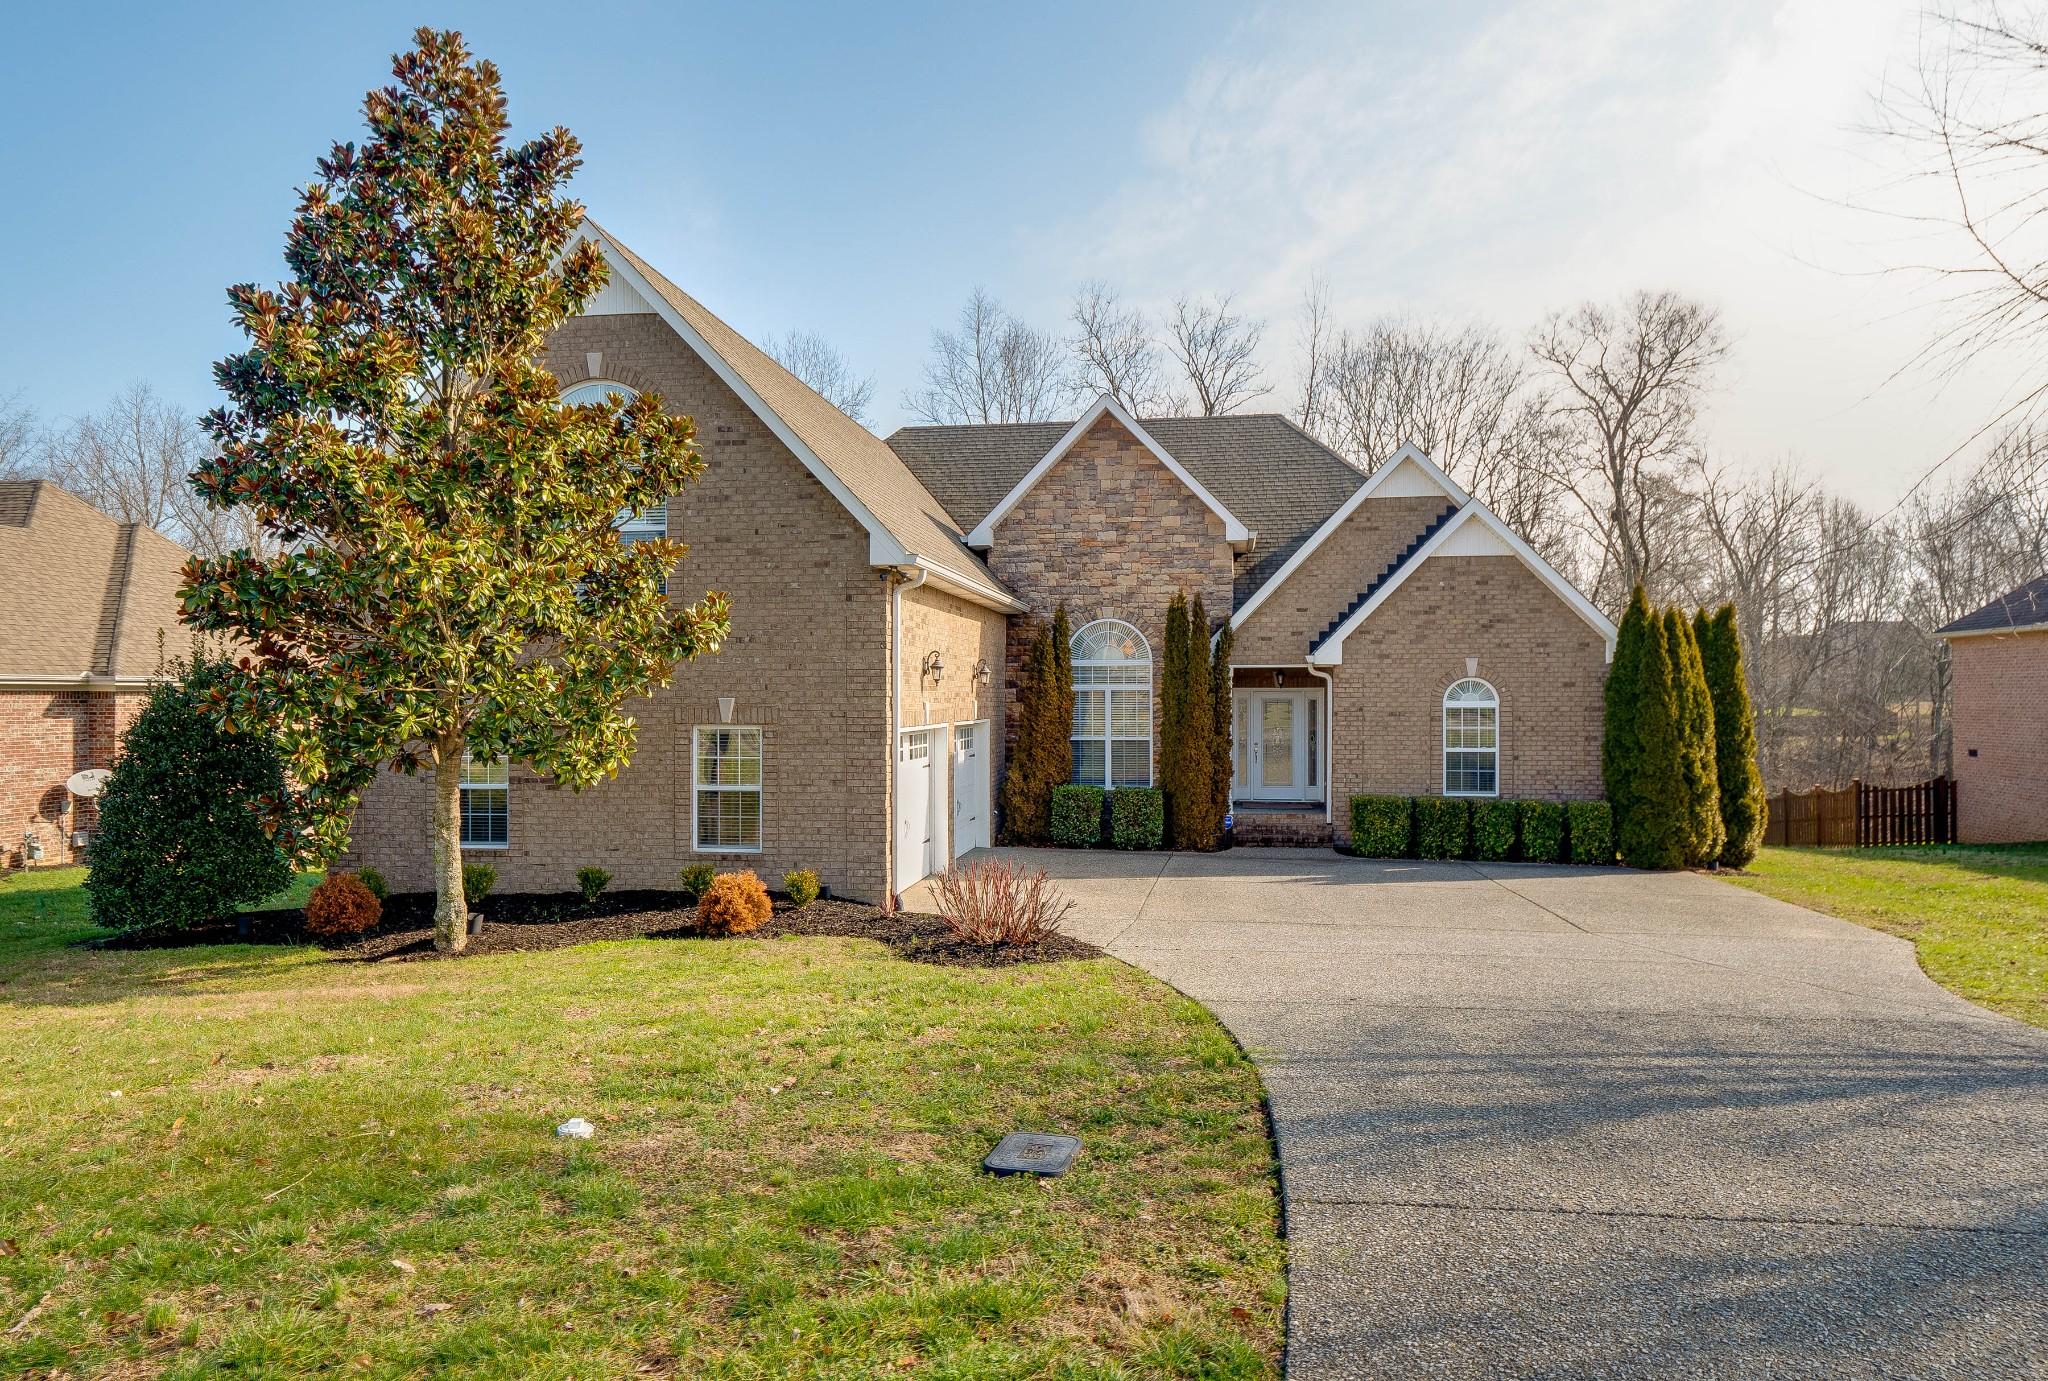 3045 Catoosa Ridge Ln Property Photo - Greenbrier, TN real estate listing